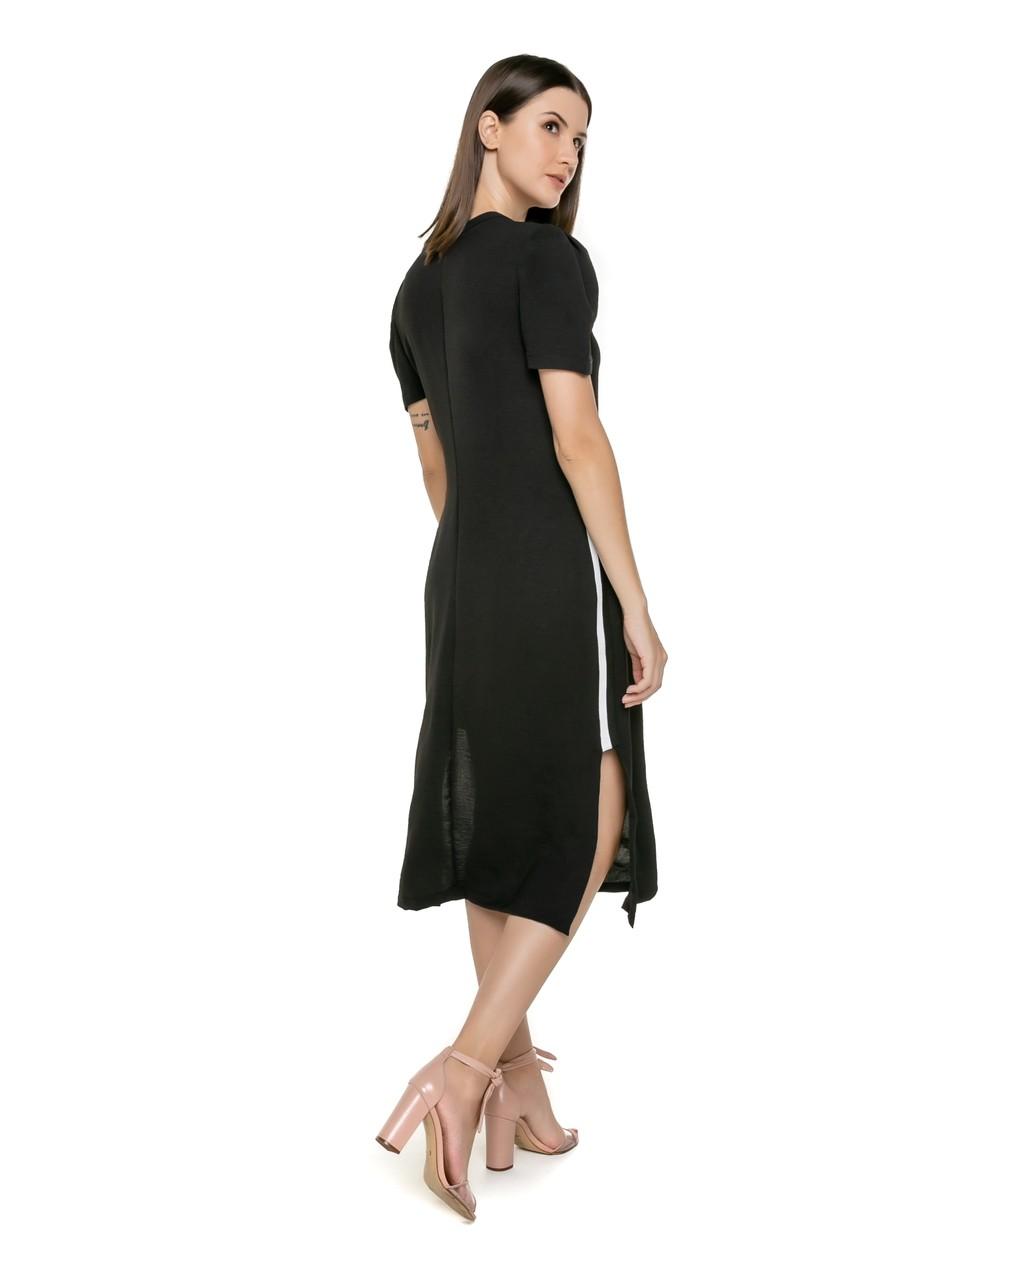 Vestido Midi com Detalhe Listrado